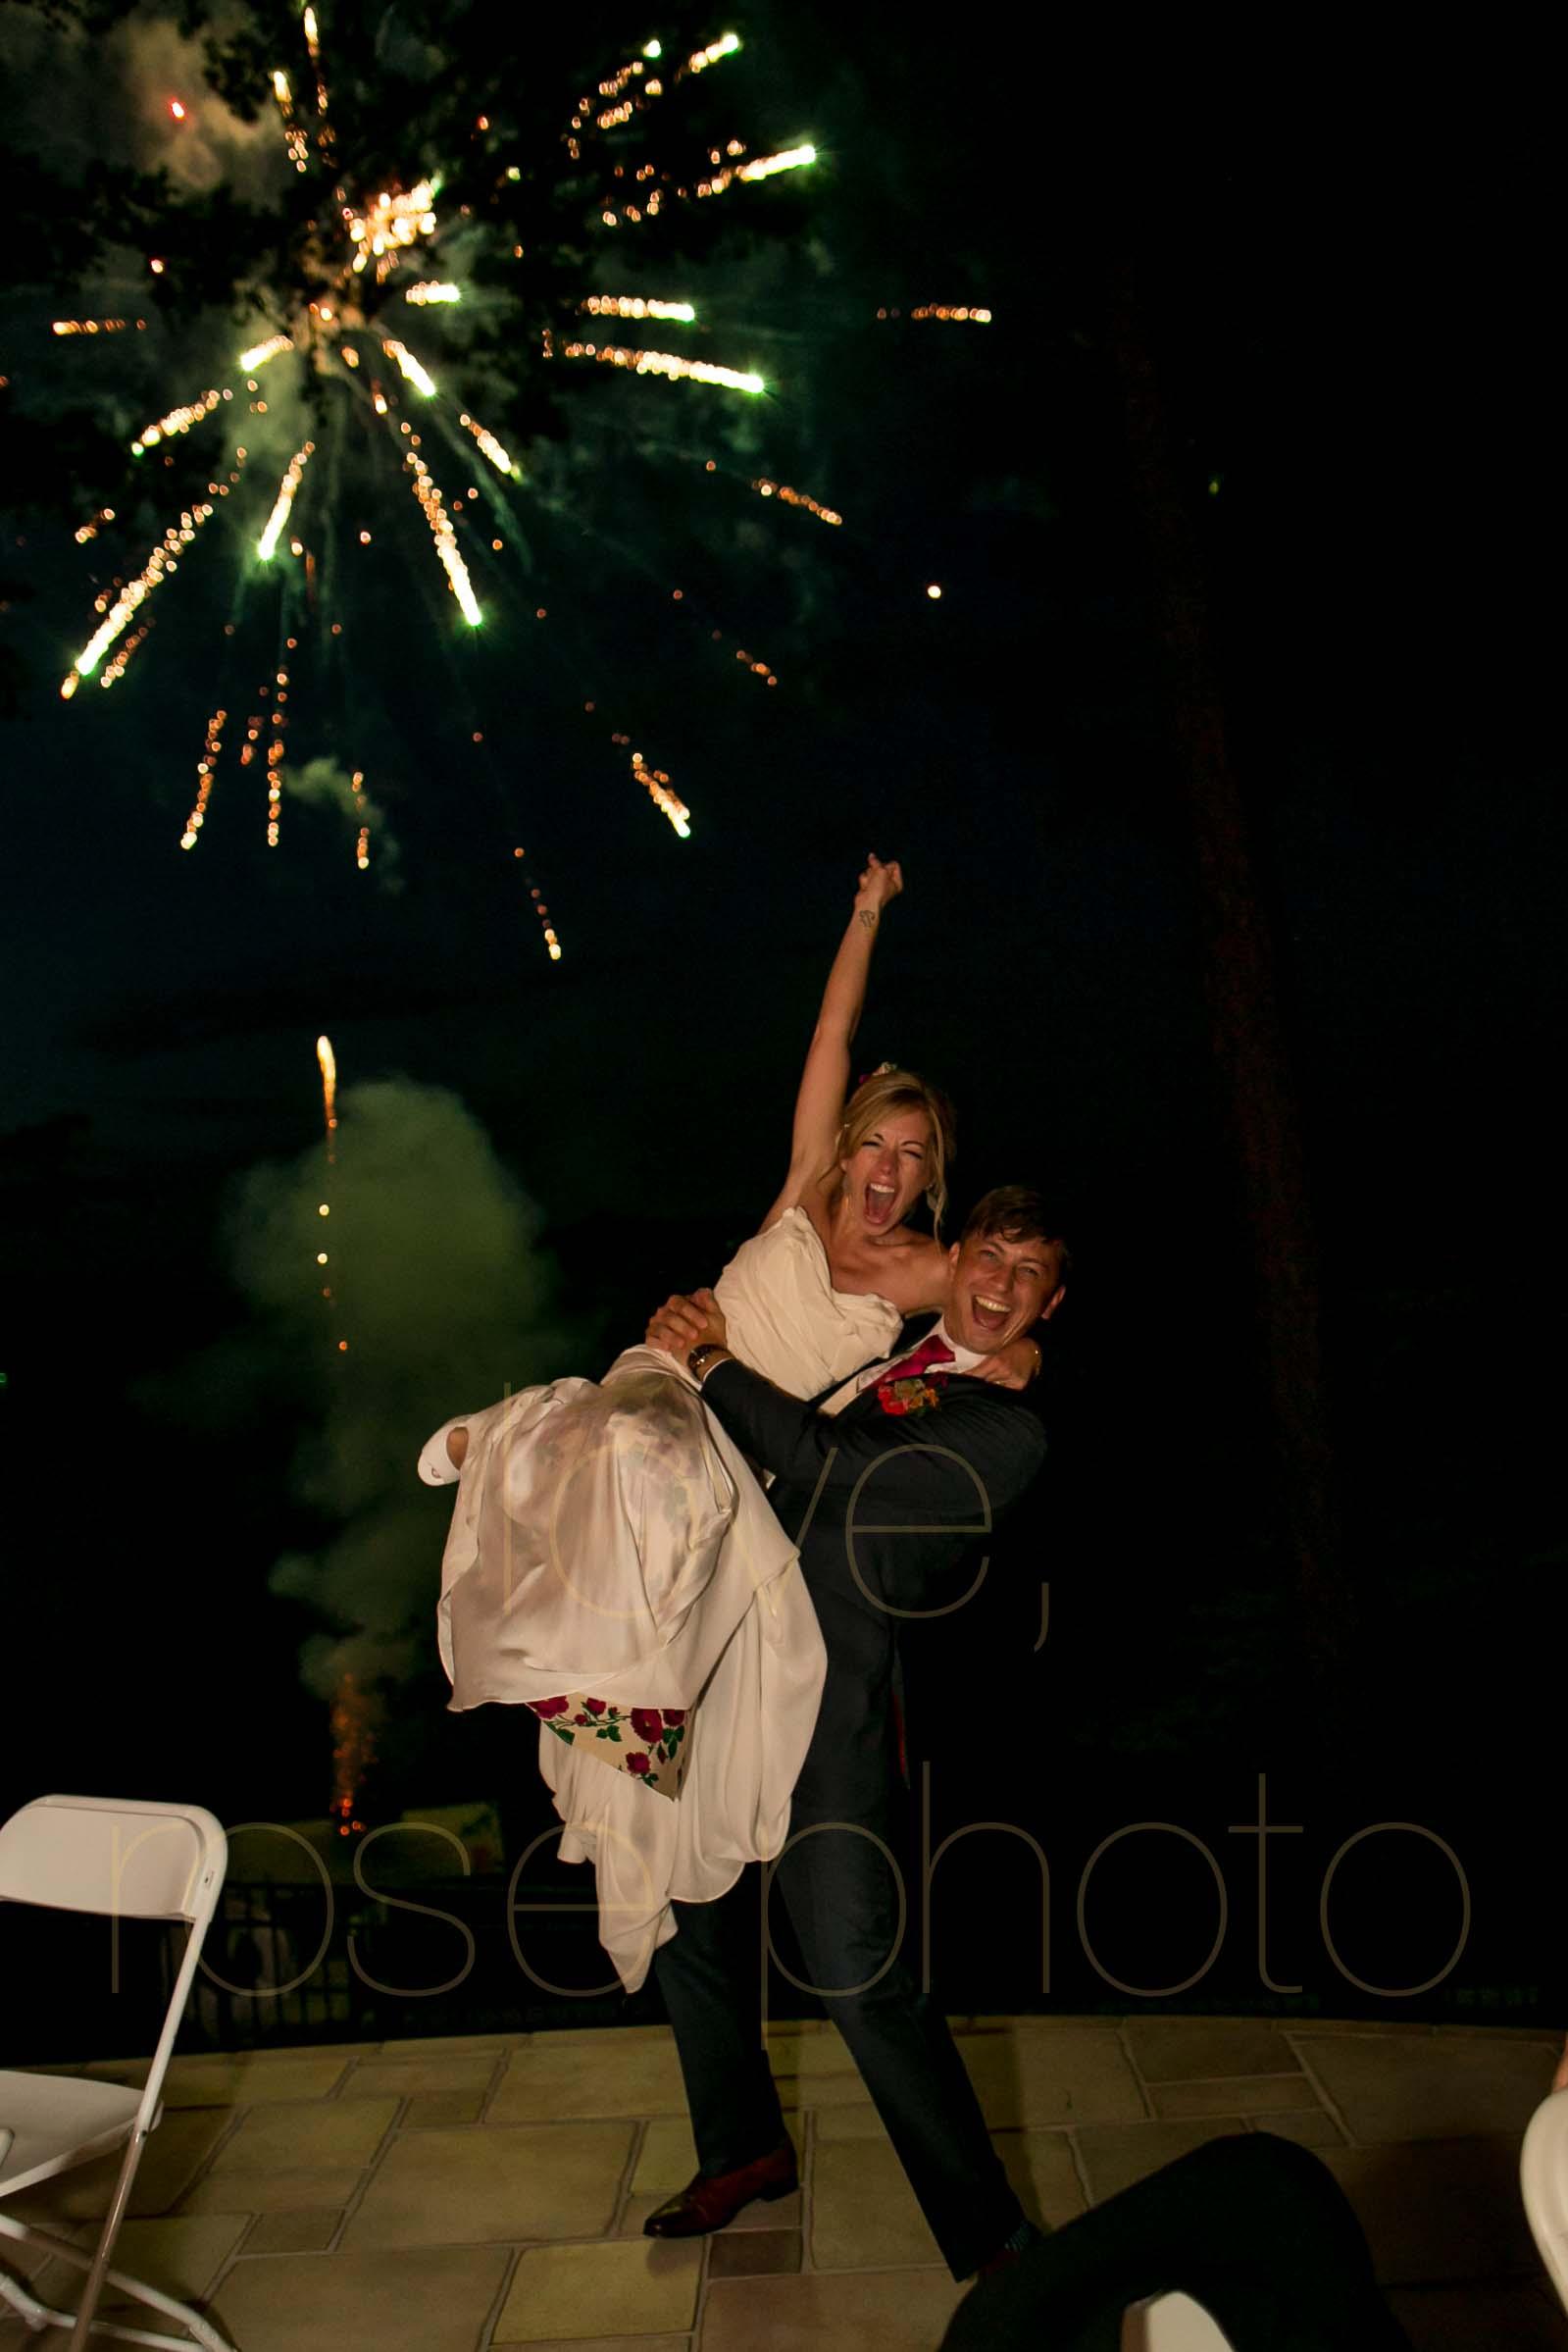 Rose Photo Asheville Wedding Photographer Nasheville Weddings Charleston Bride Chicago photojournalist weddings -57.jpg